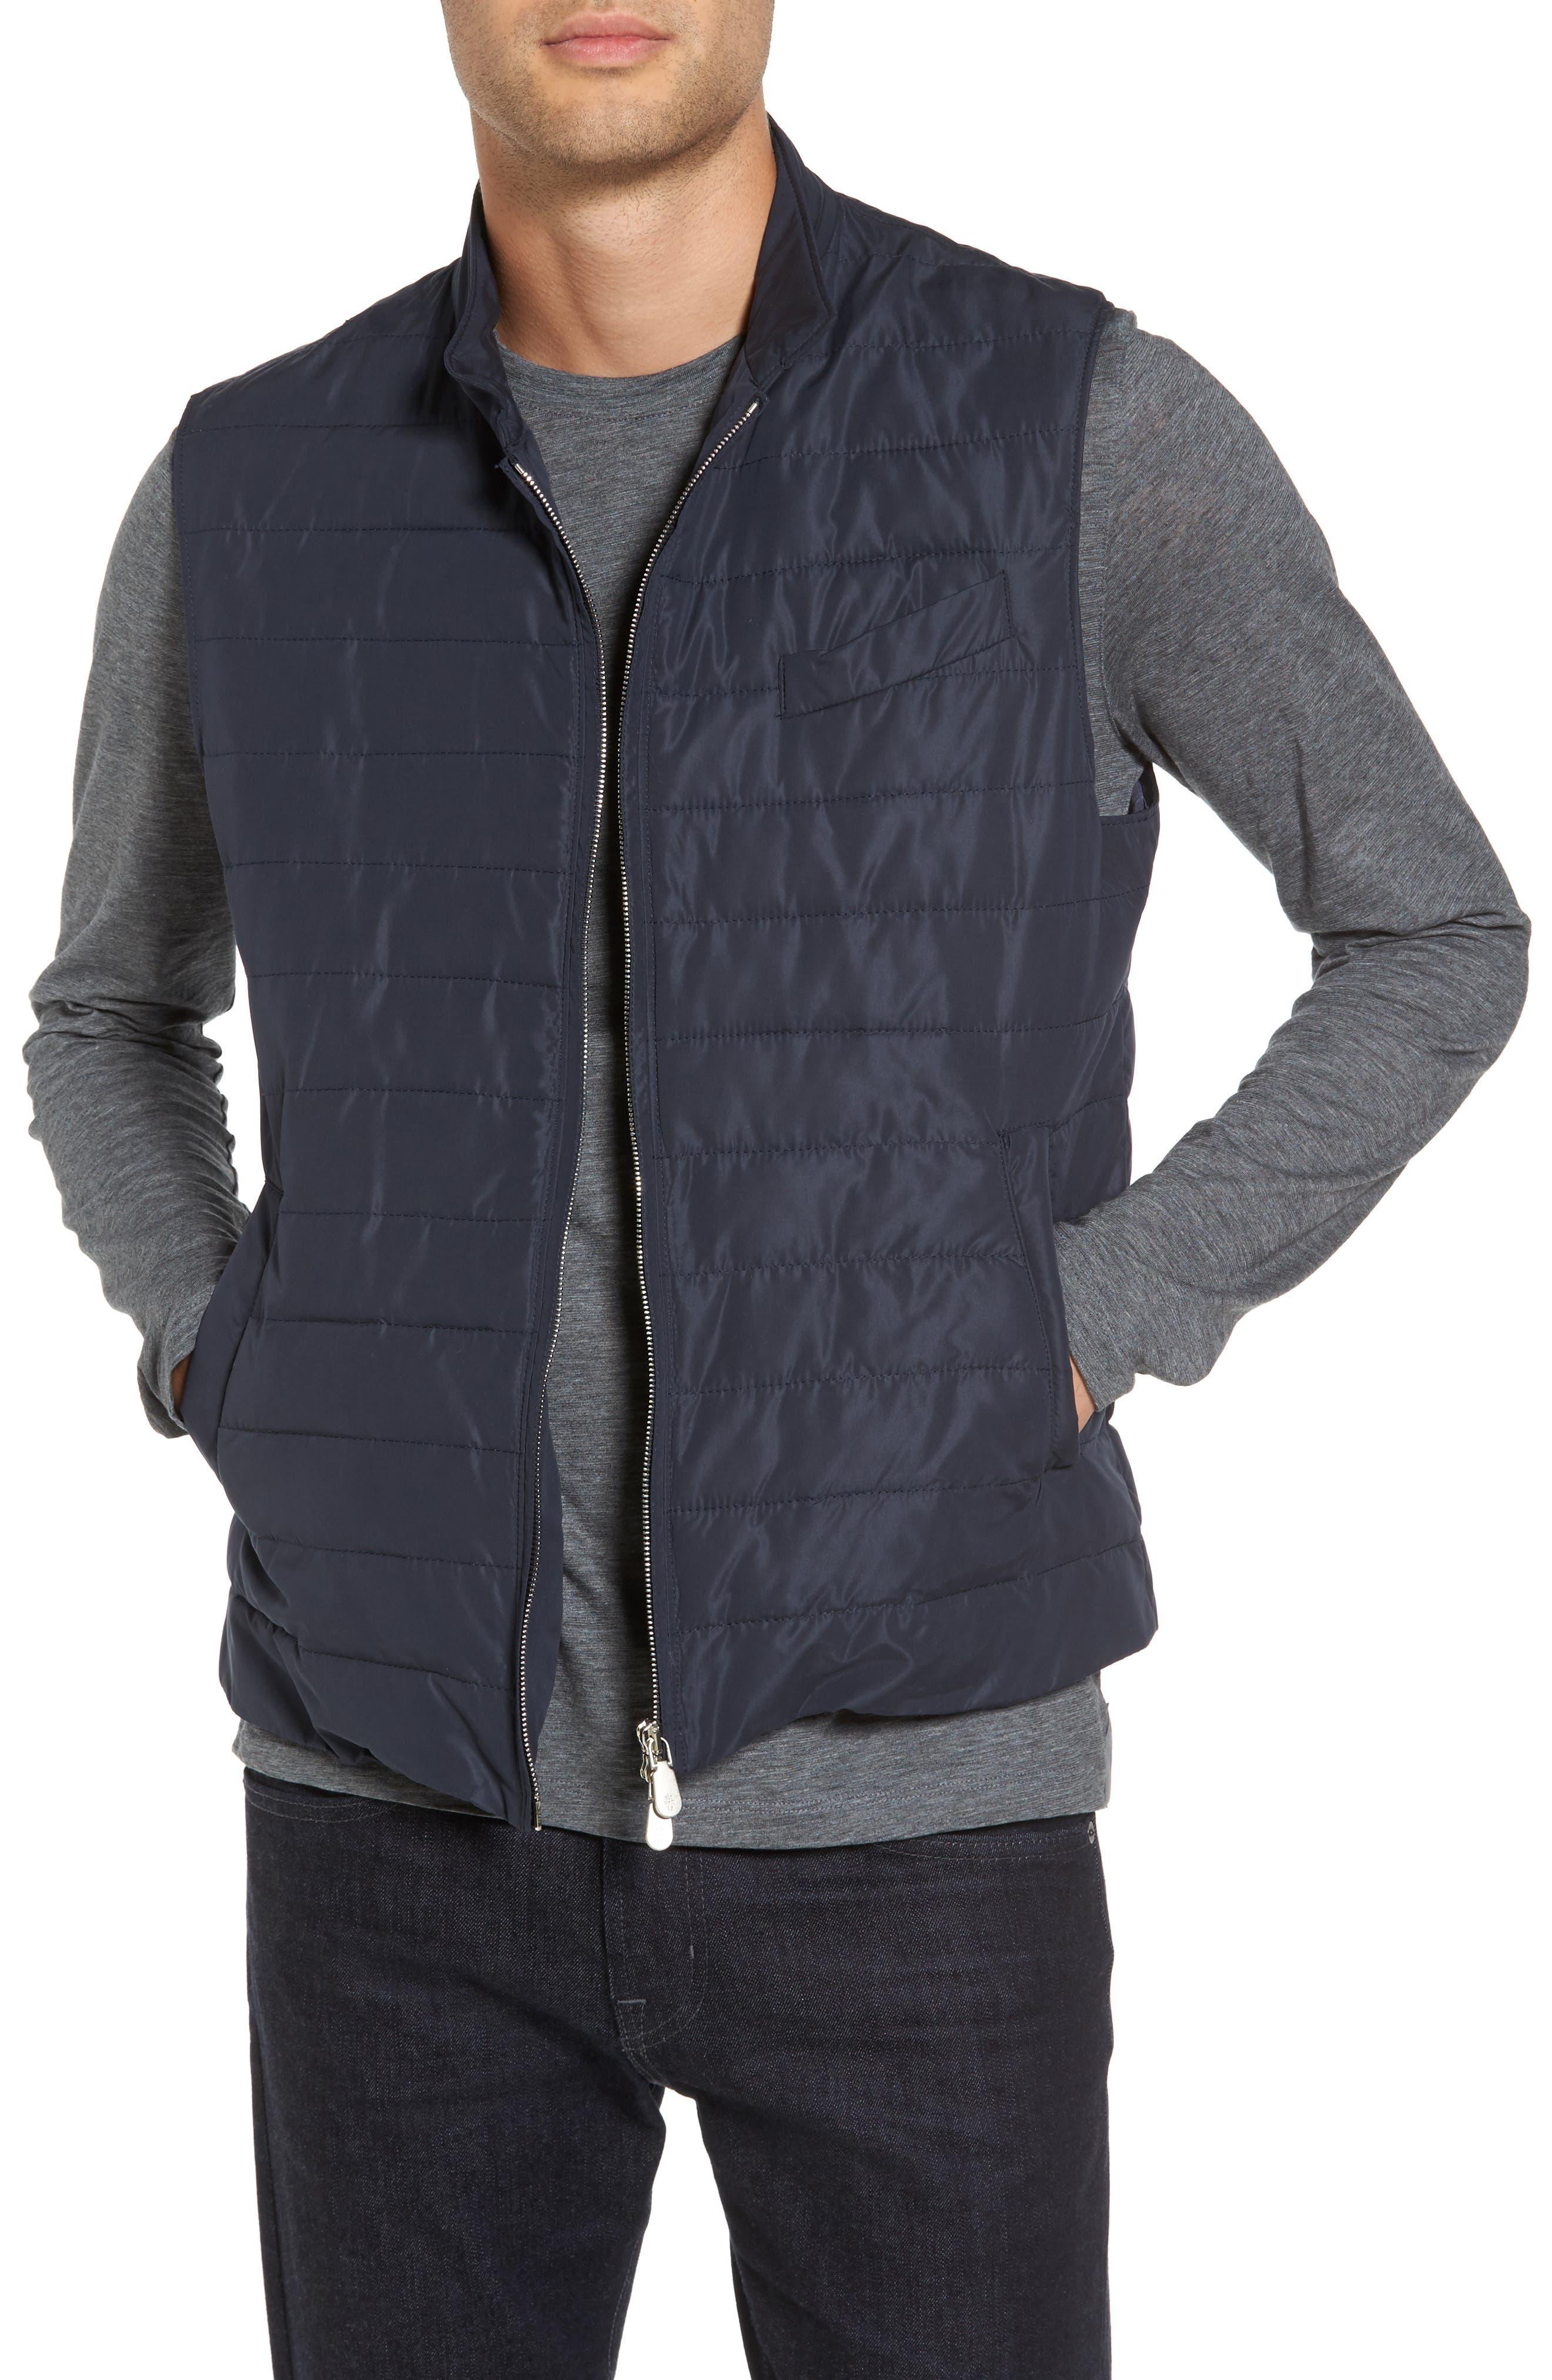 Full Zip Vest,                             Main thumbnail 1, color,                             NAVY